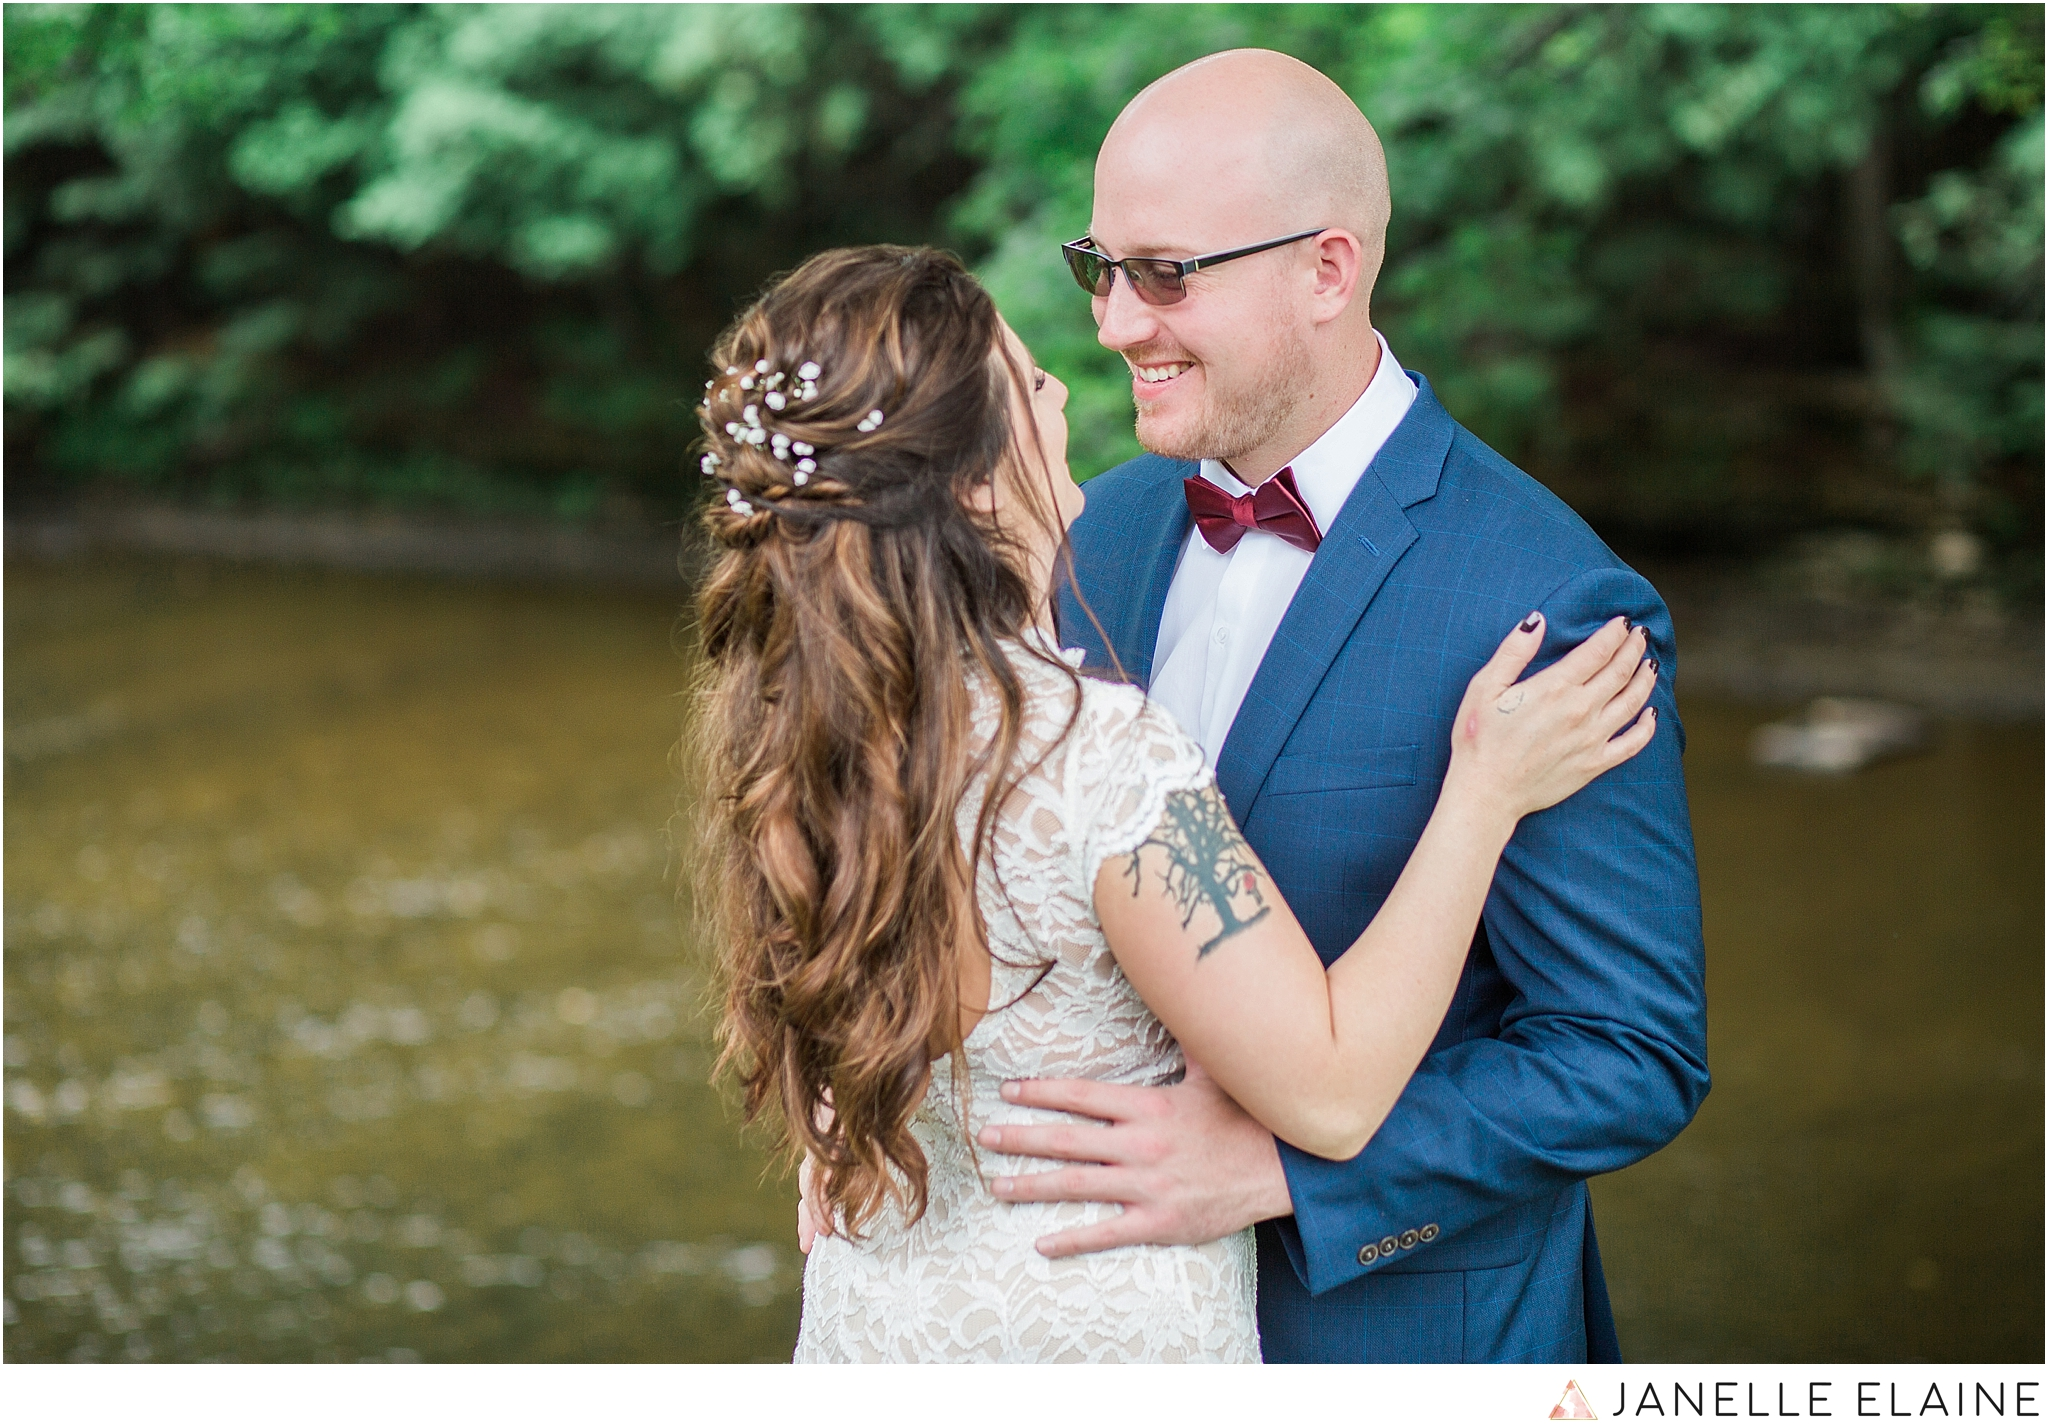 janelle elaine photography-seattle-destination-wedding-photographer-25.jpg